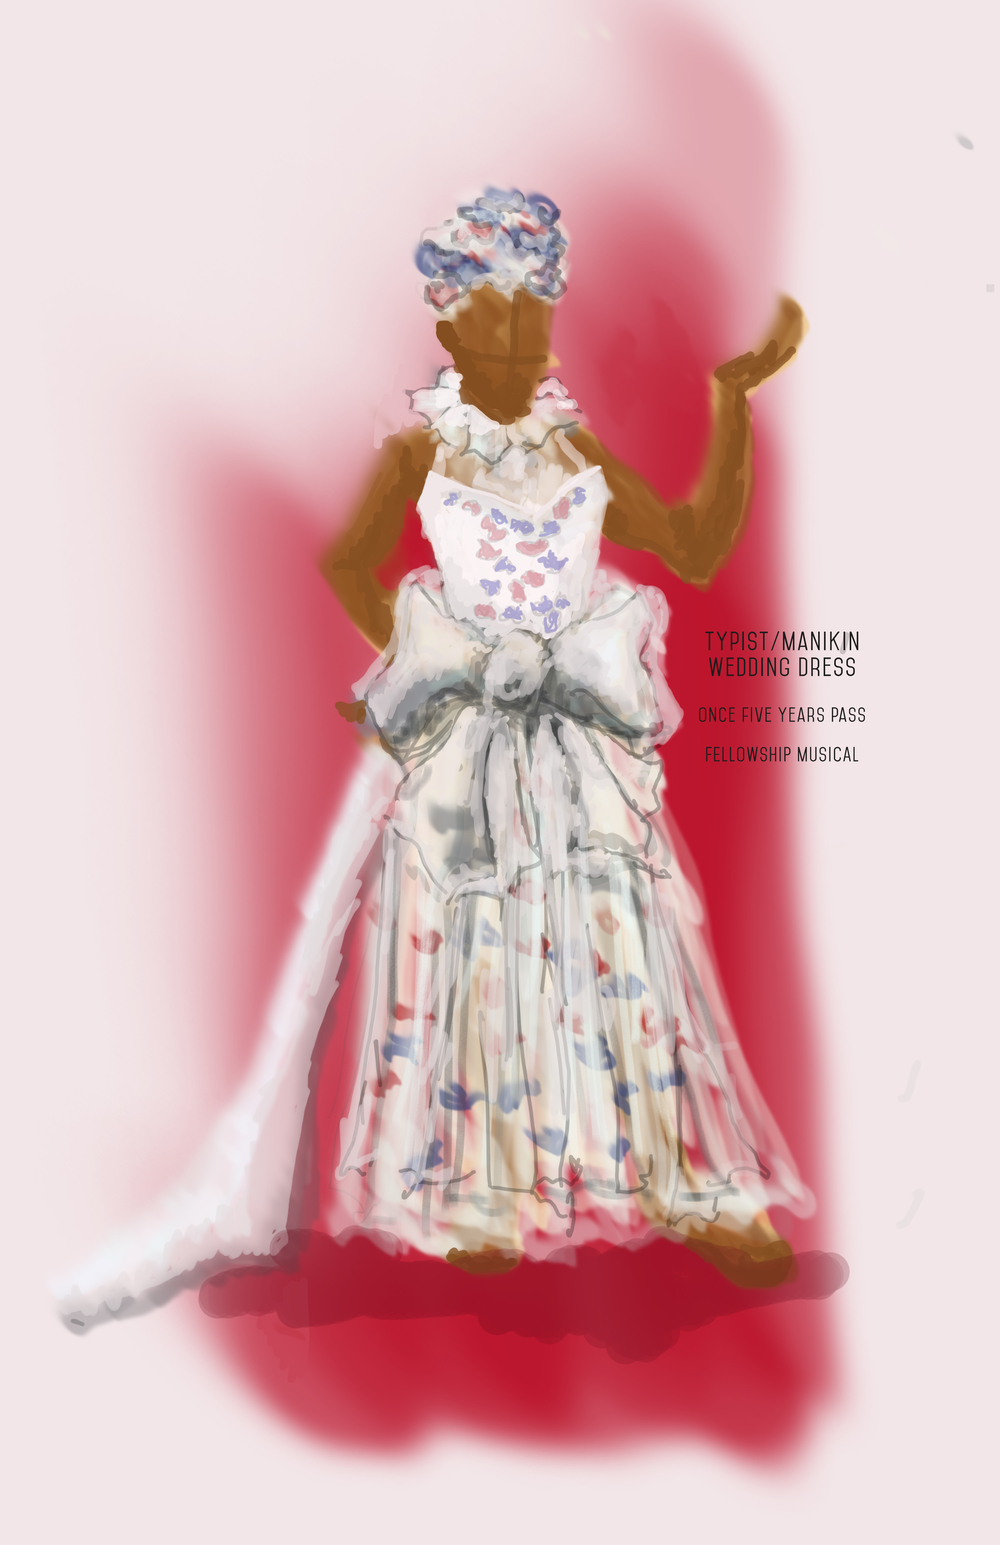 OFYP - WEDDING DRESS.jpg